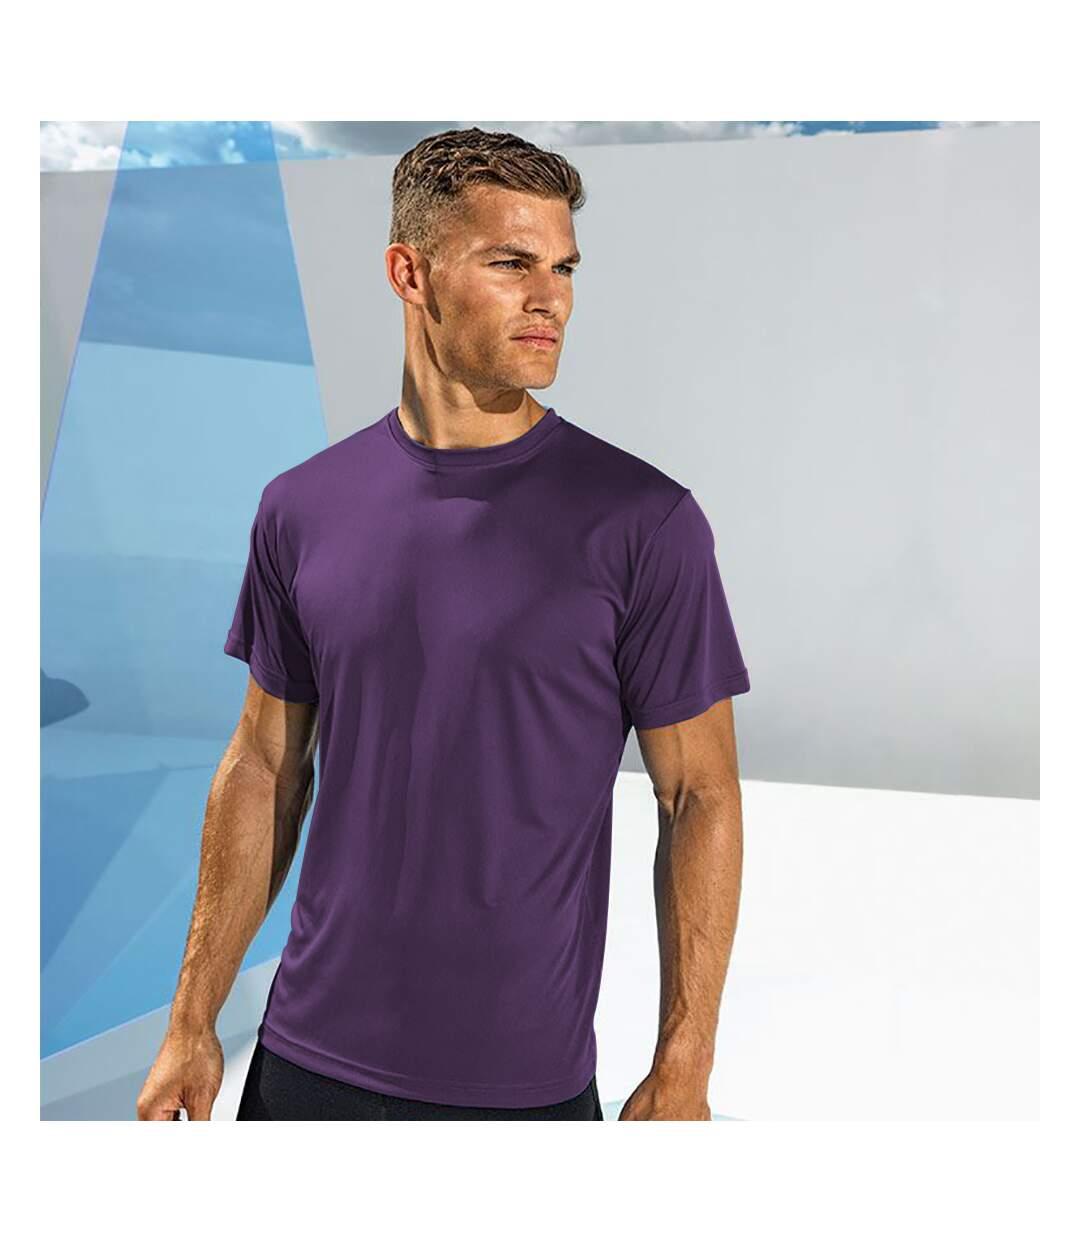 Tri Dri Mens Short Sleeve Lightweight Fitness T-Shirt (Orange) - UTRW4798